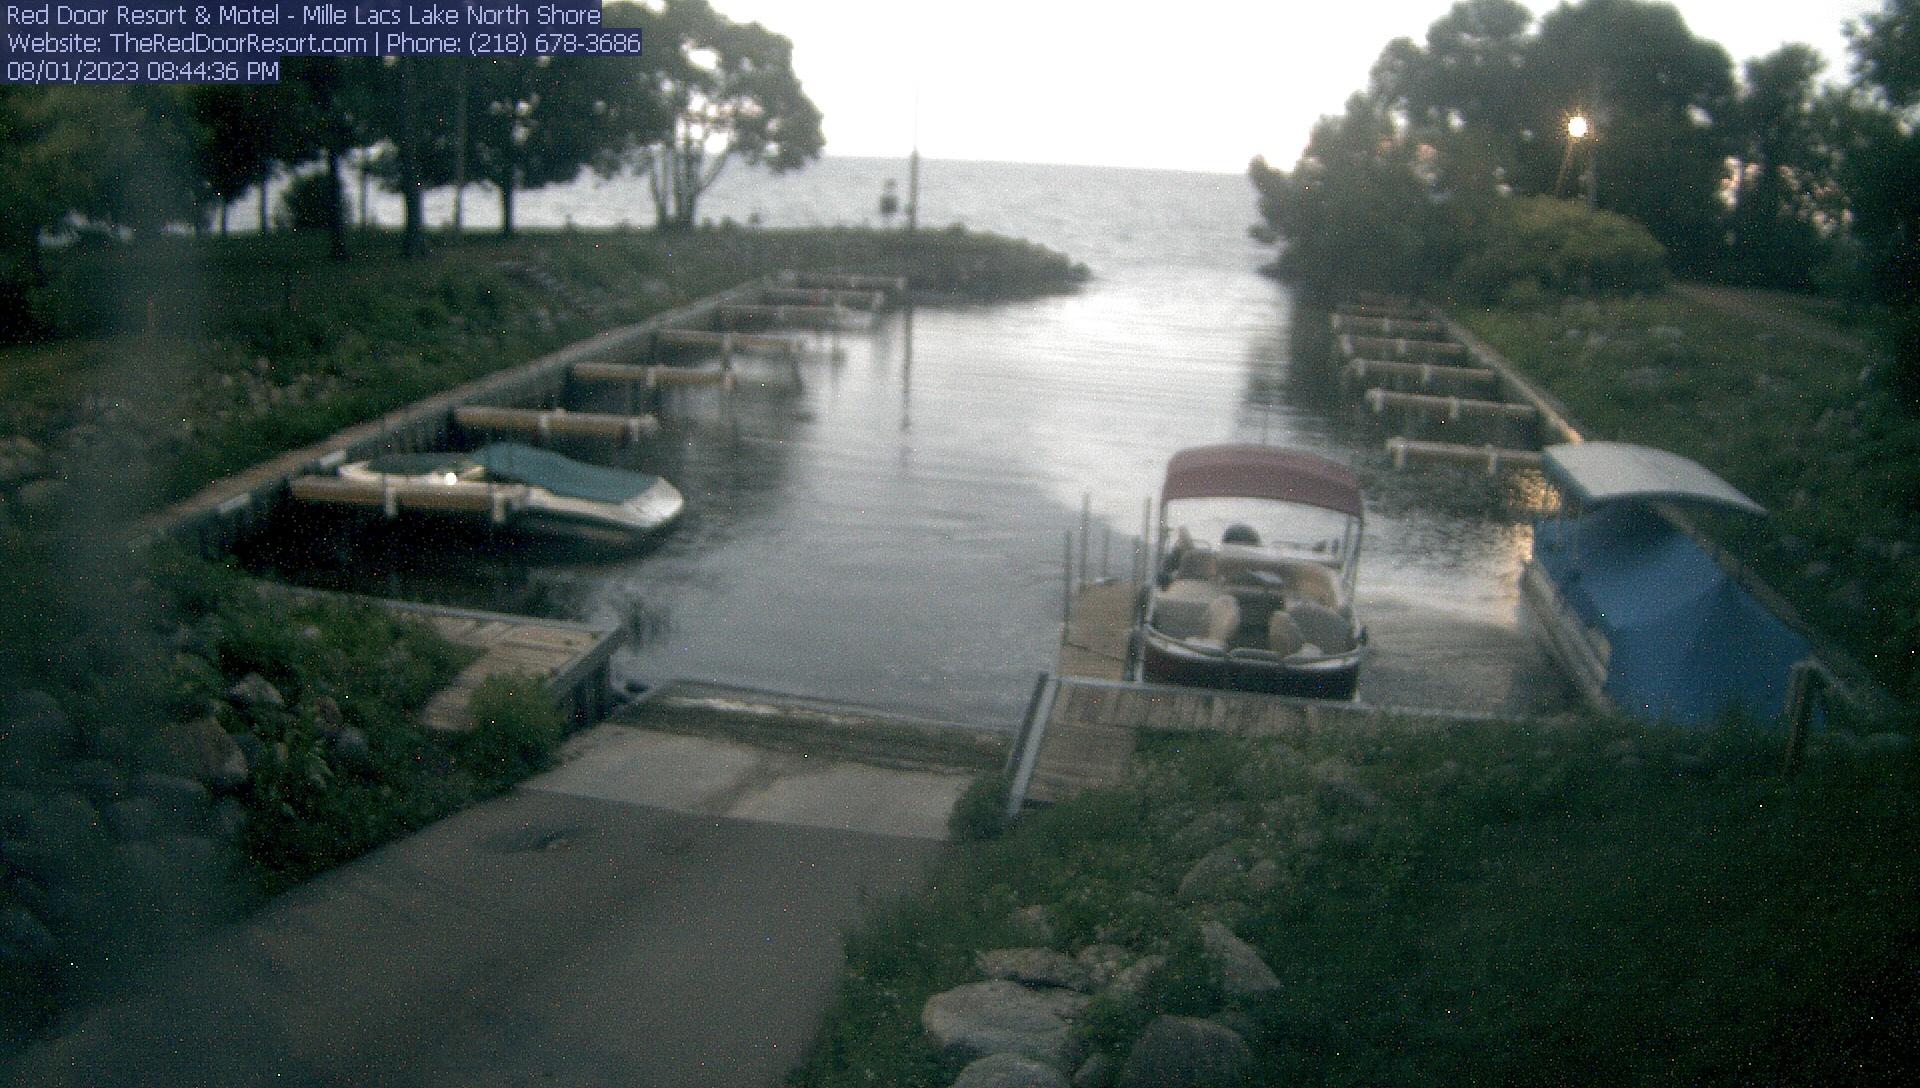 Mille Lacs Lake Webcams Home Page